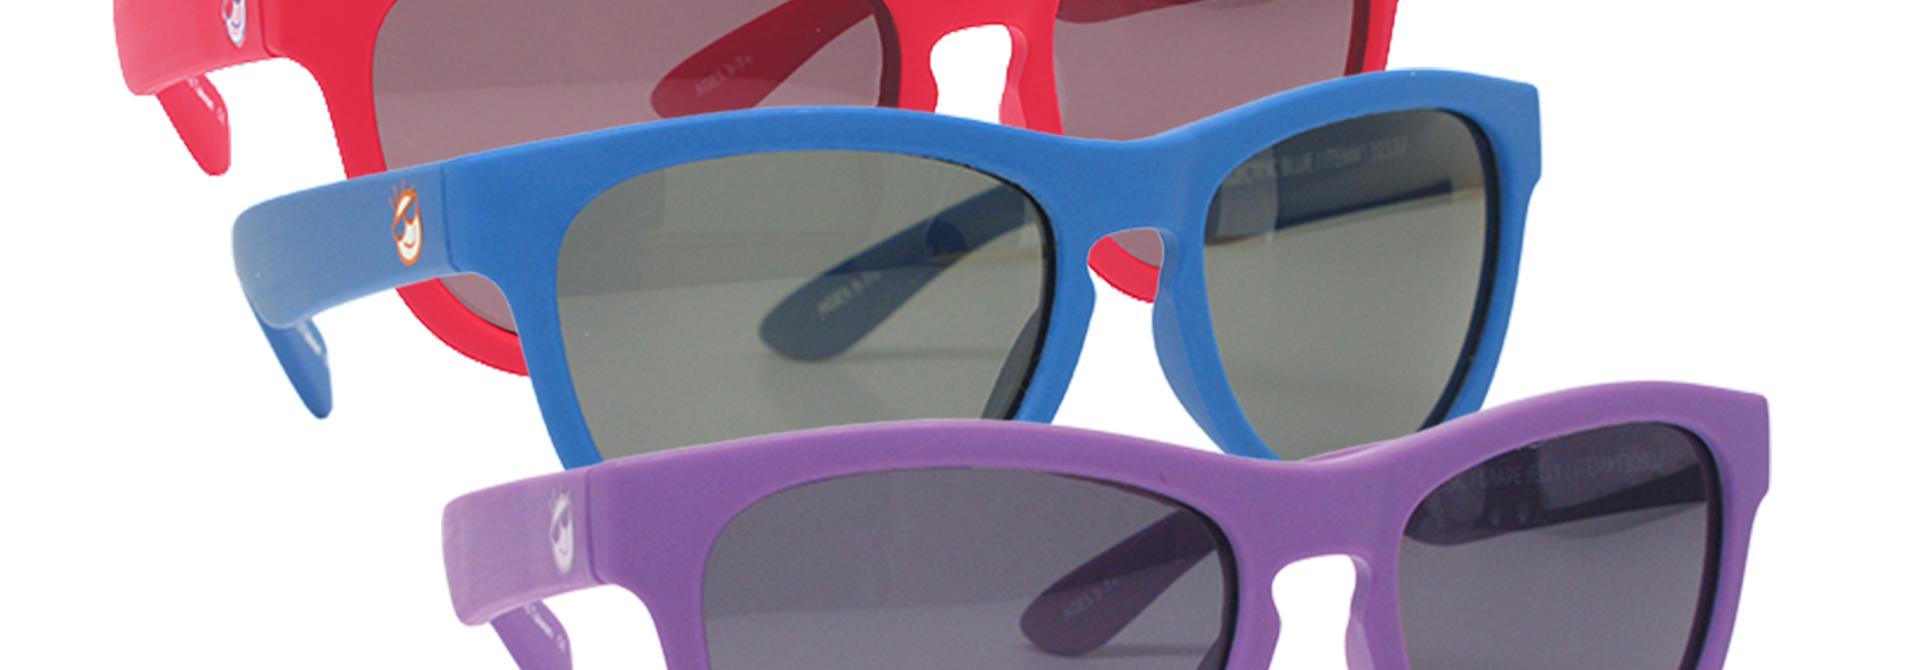 K's Reflekt Polarized Classic Mini Shades, 3-7+